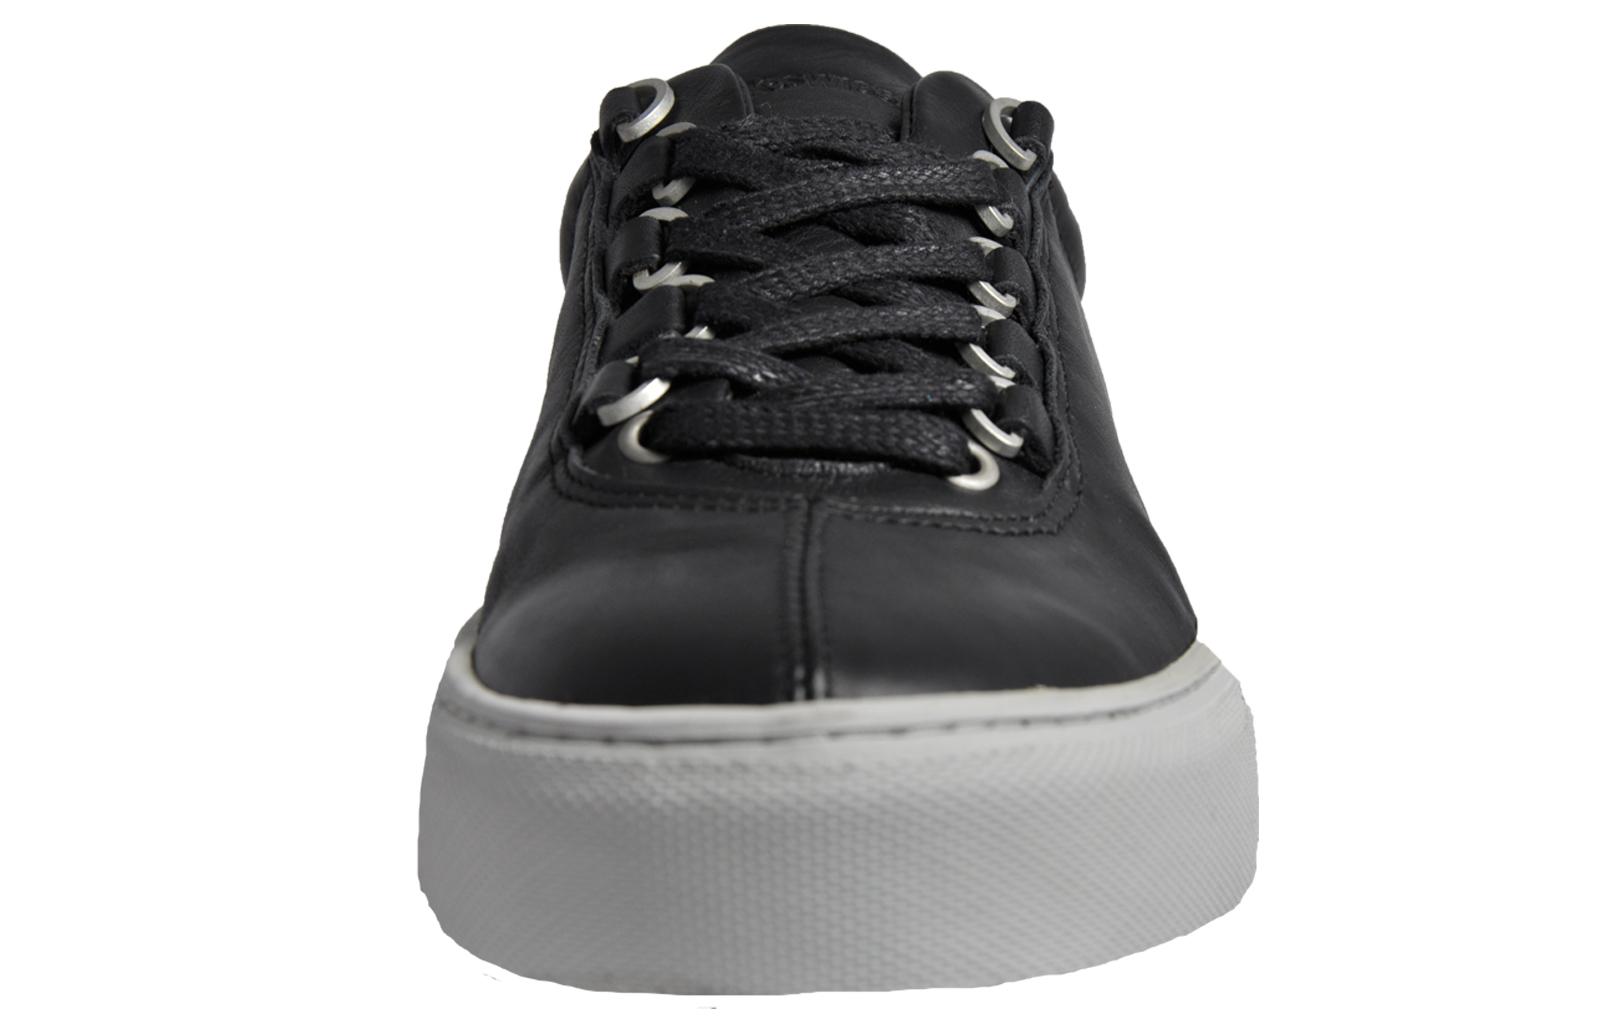 Leather Hi Top Retro Trainers Black